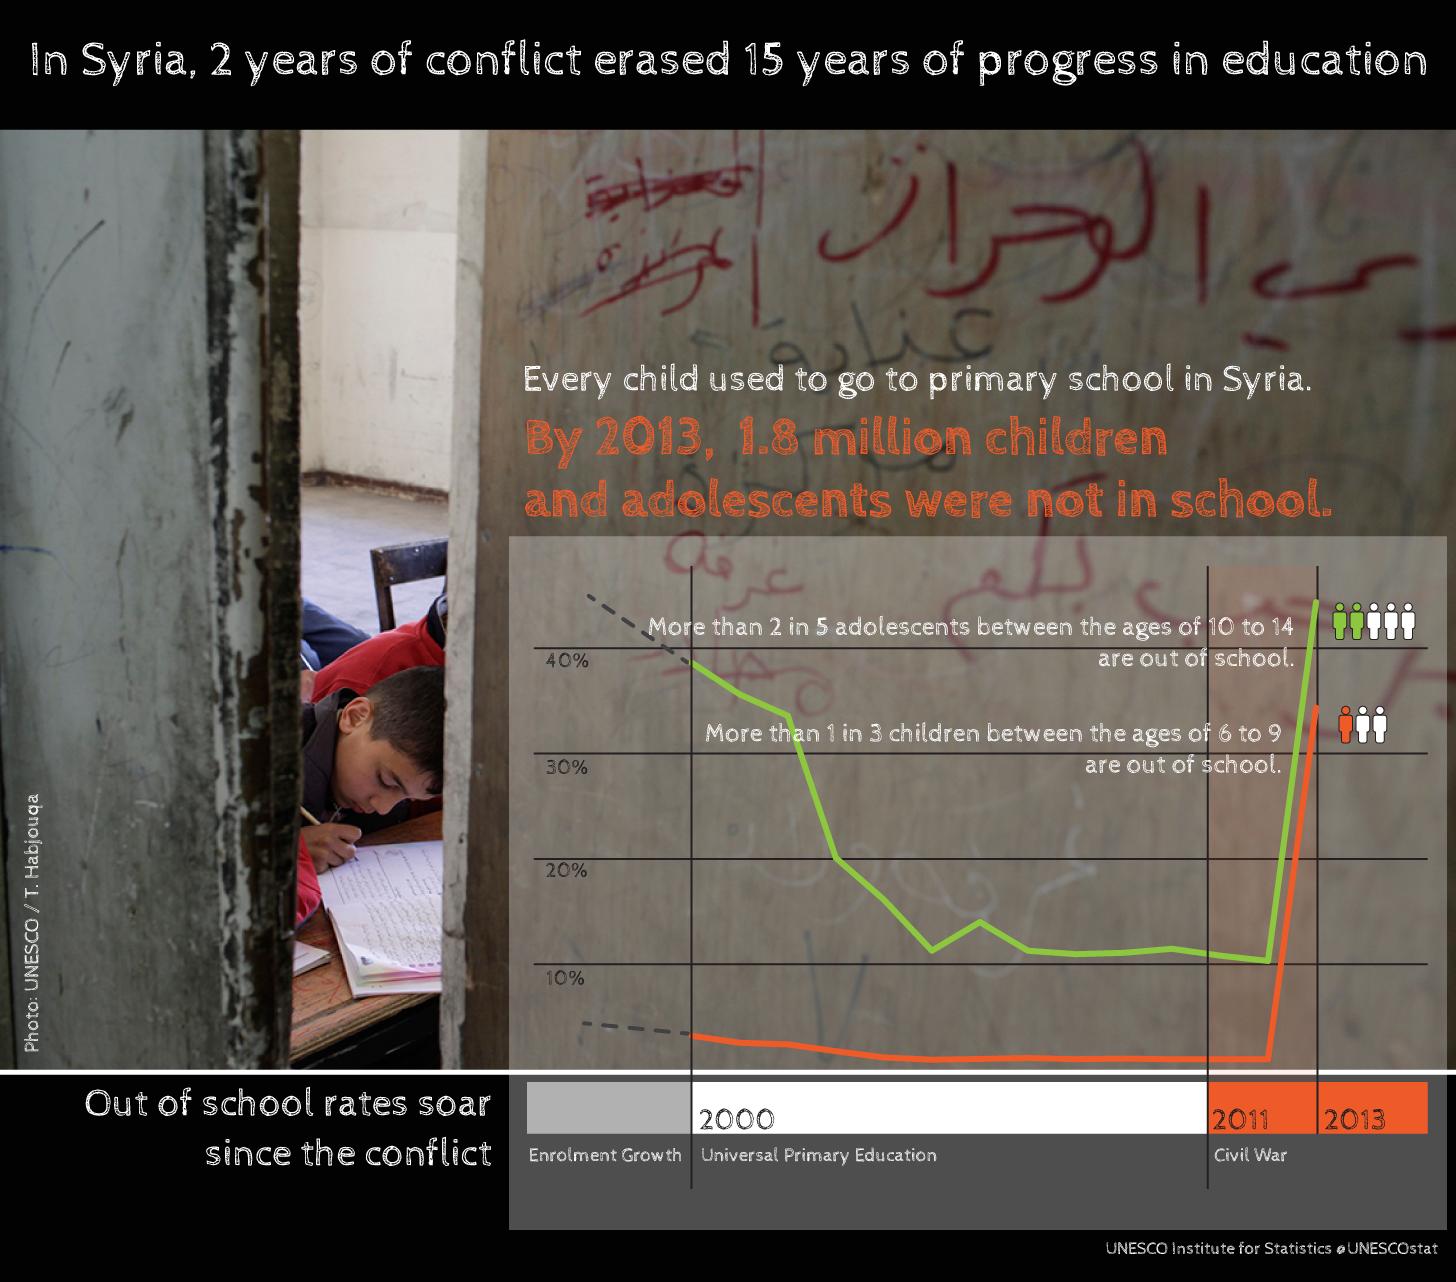 UIS-syria_2015